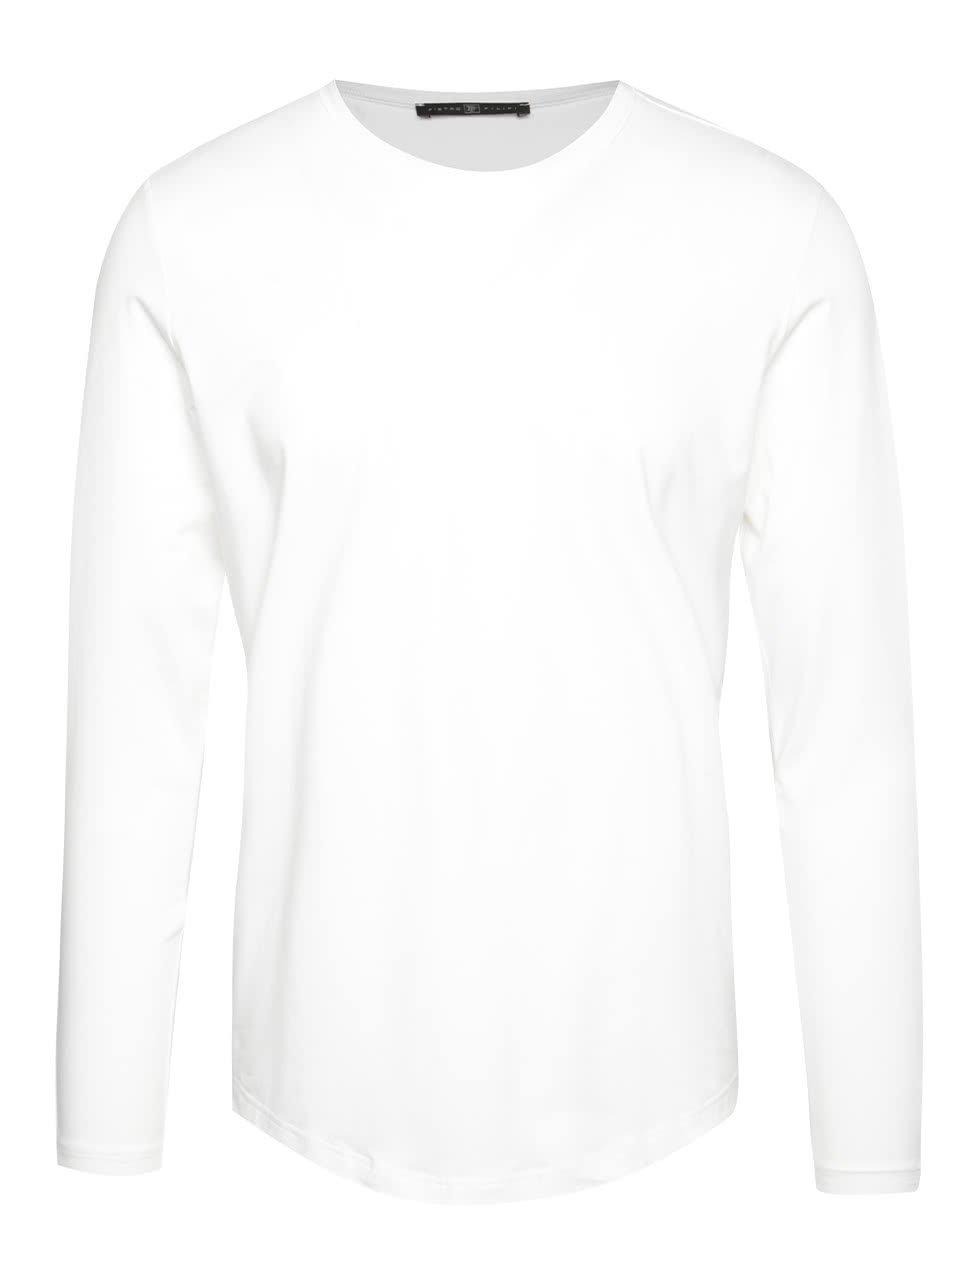 Bílé pánské triko s dlouhým rukávem Pietro Filipi